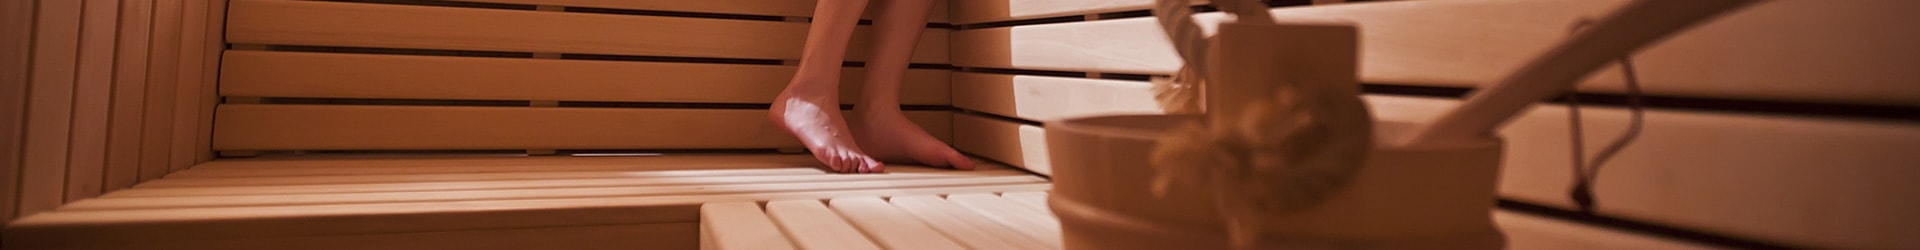 Sauna accessoires